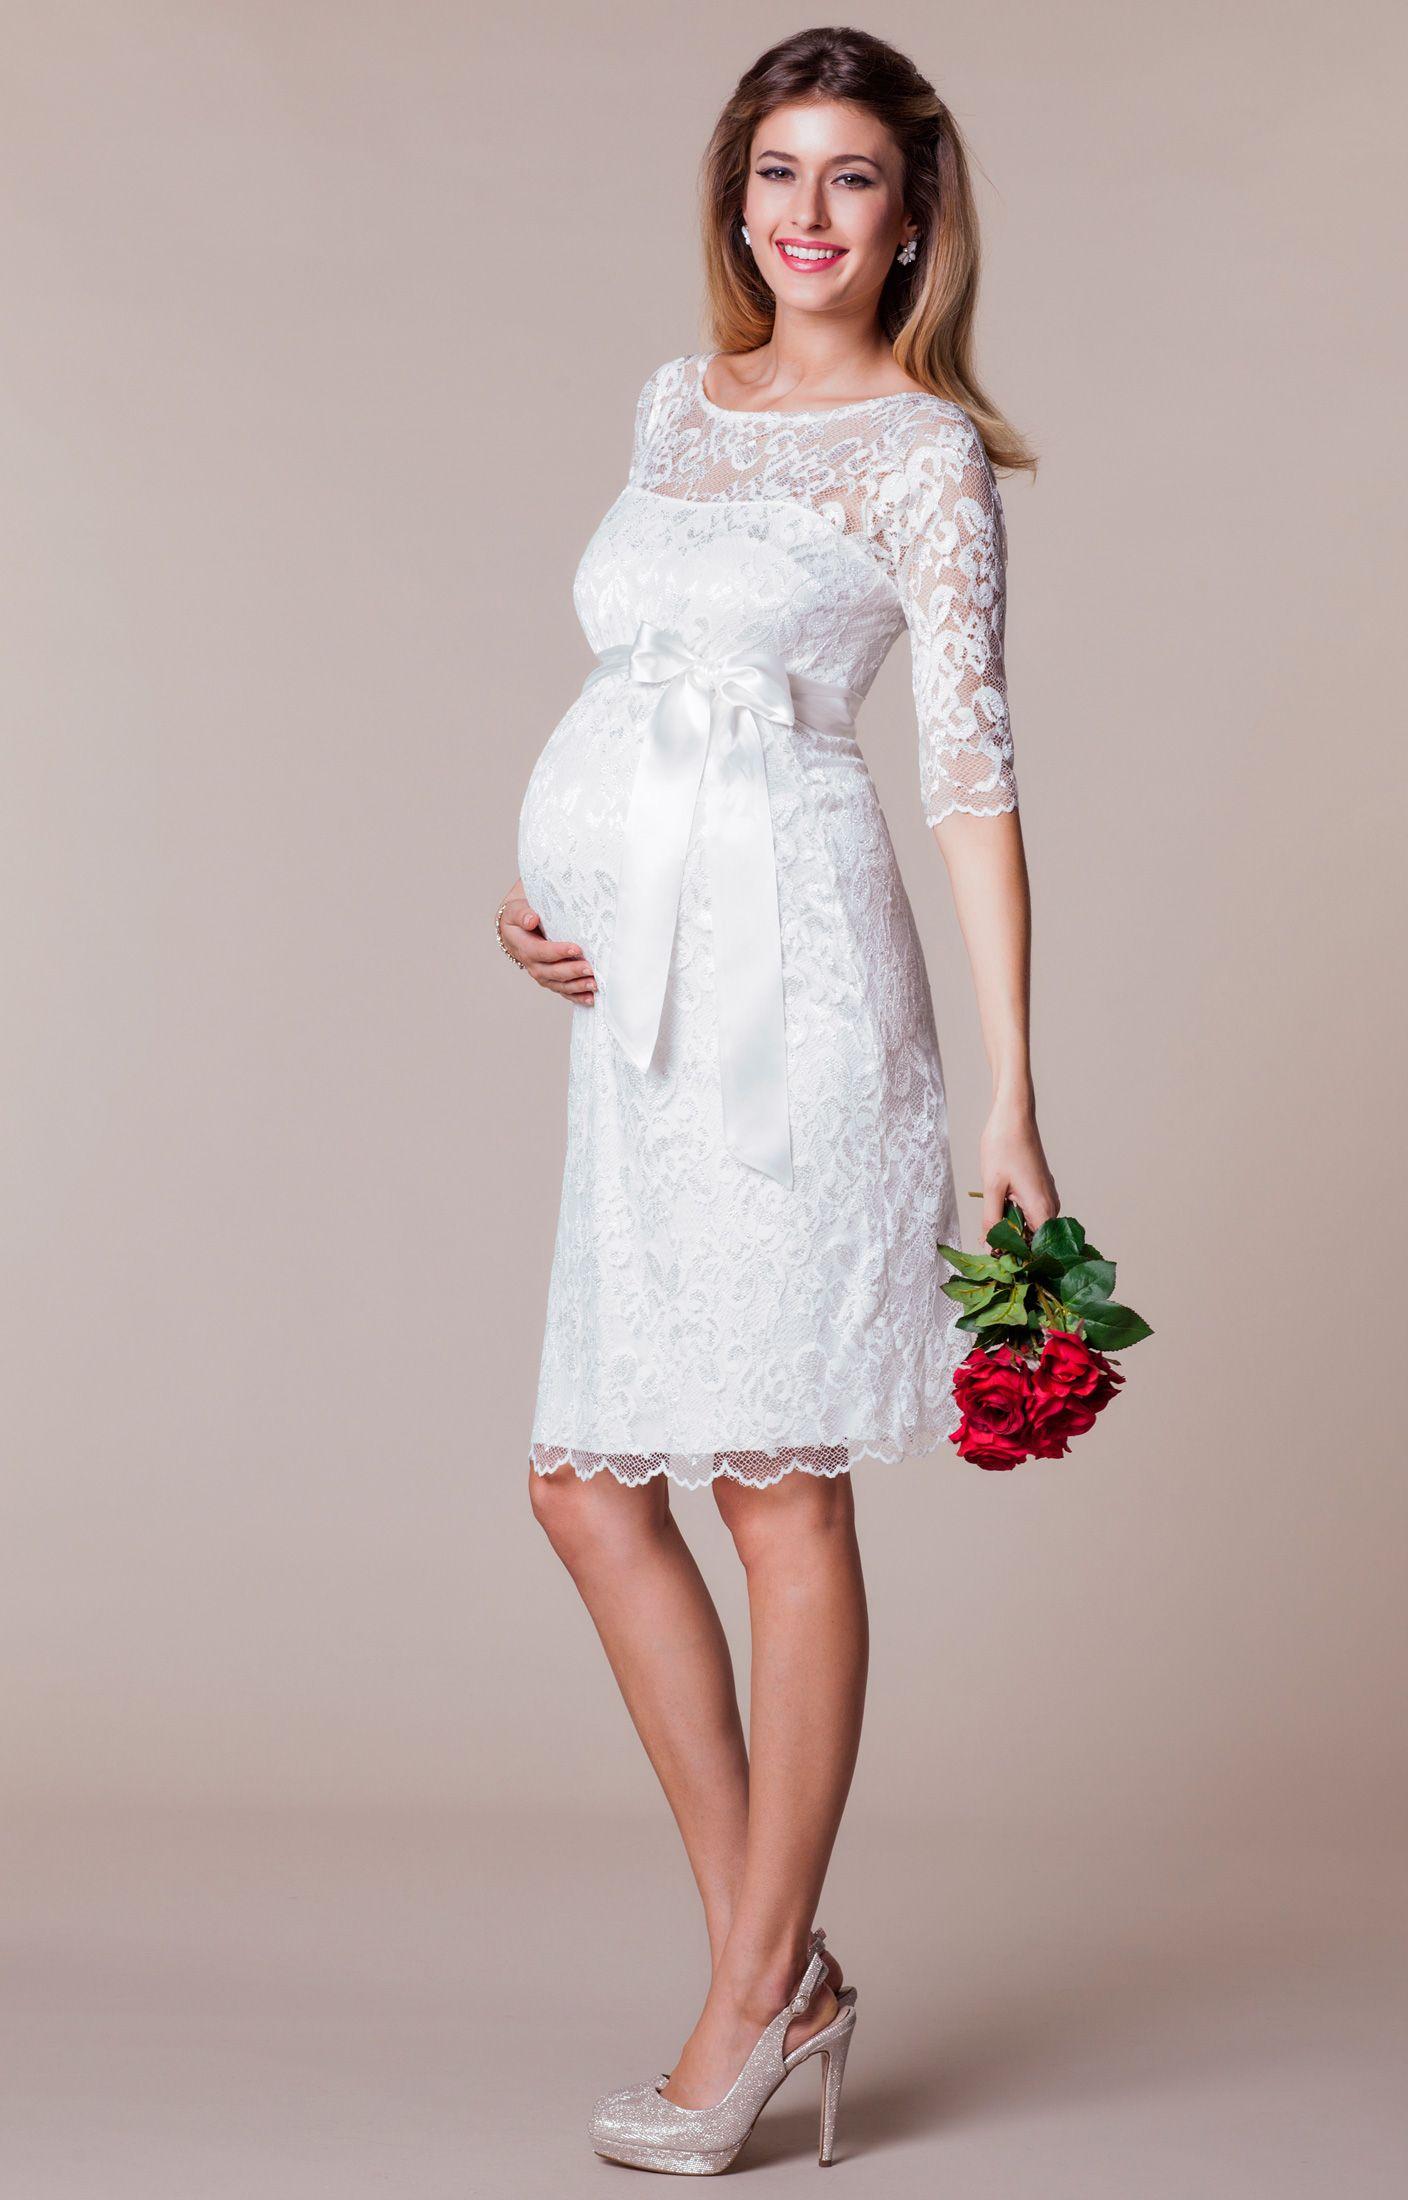 Amelia dress short tiffany rose amelia and ivory amelia dress short ombrellifo Gallery